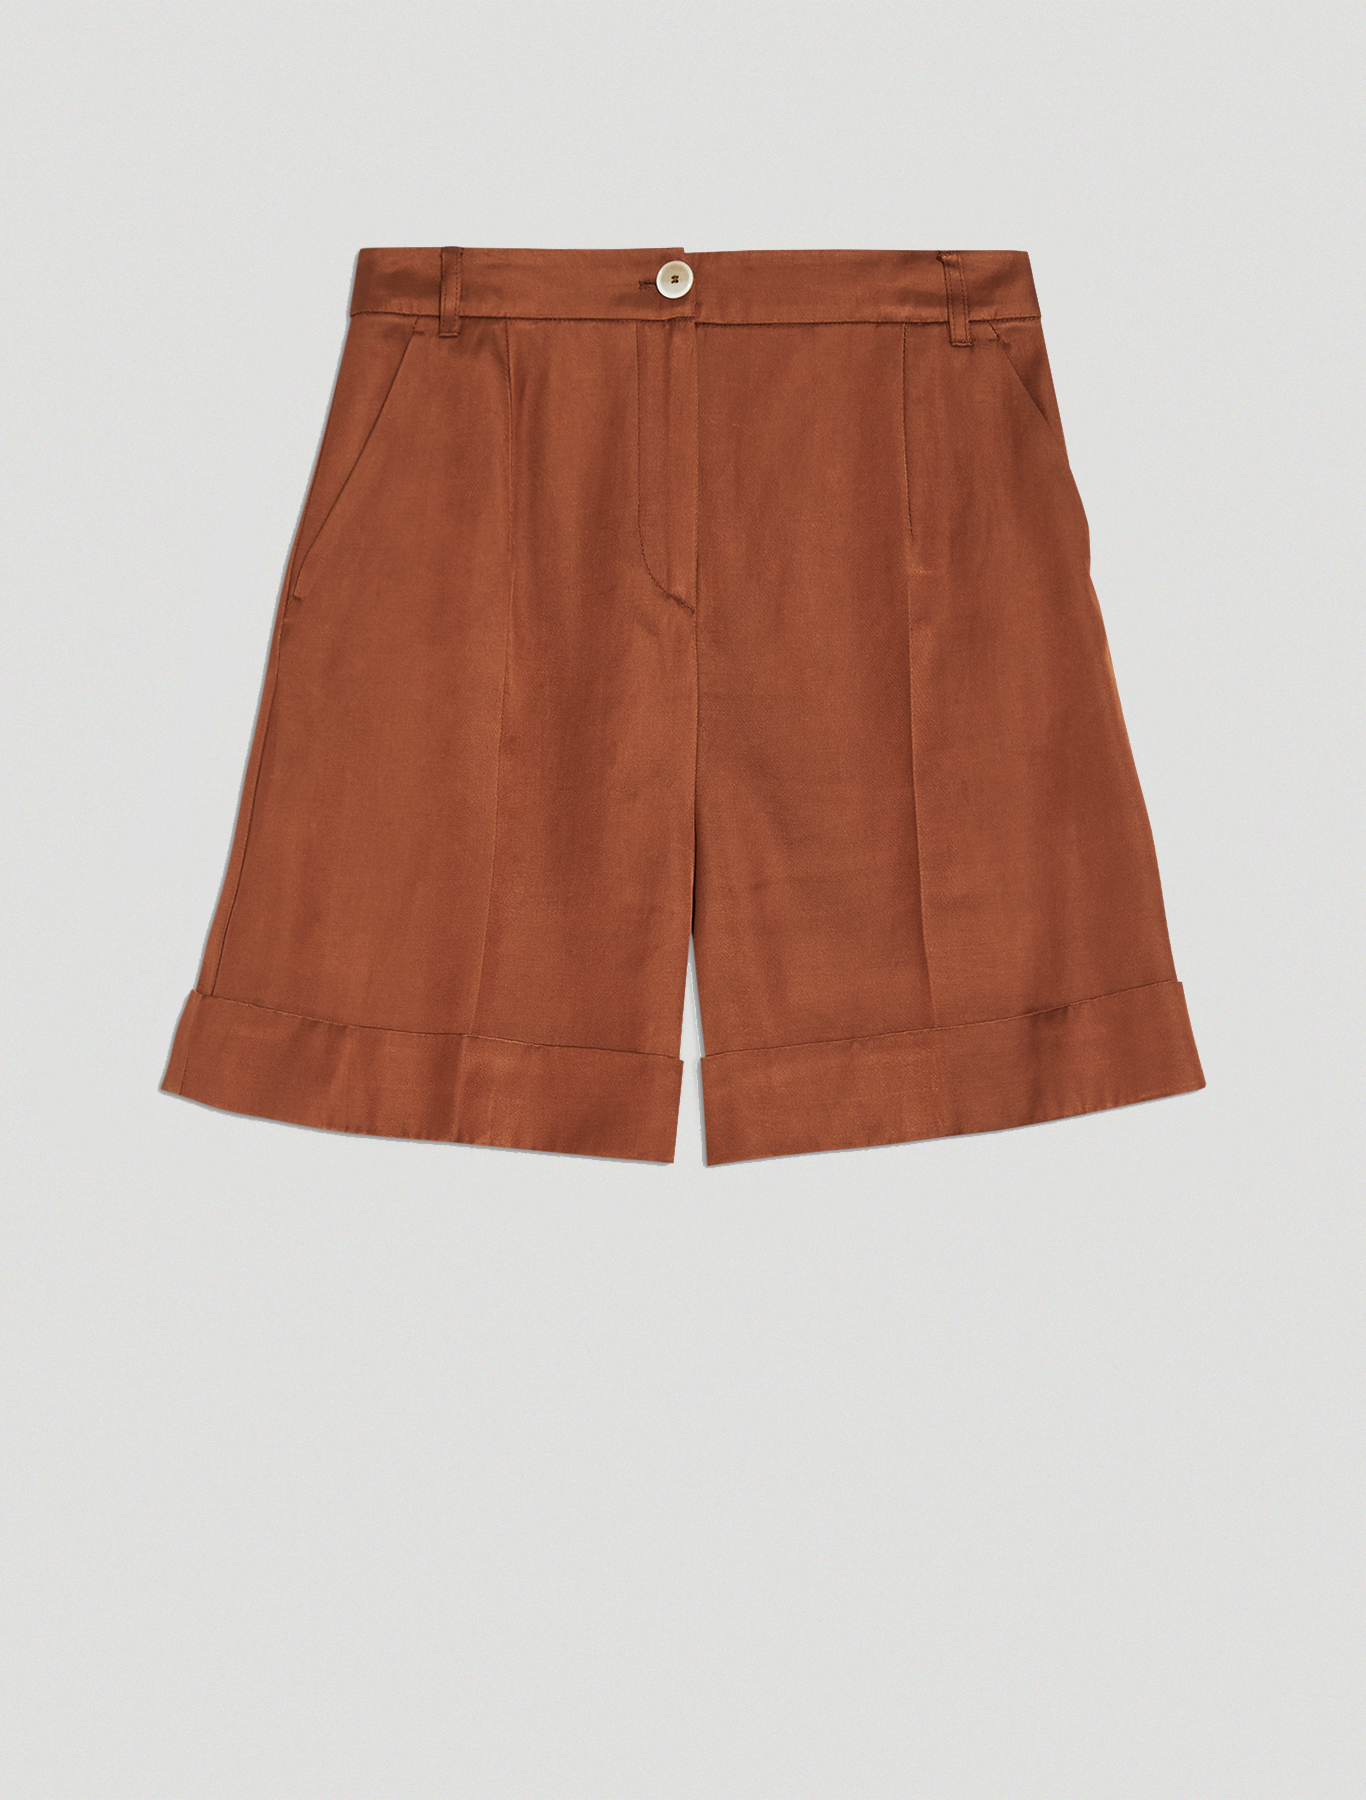 Twill Bermuda shorts - brown - pennyblack